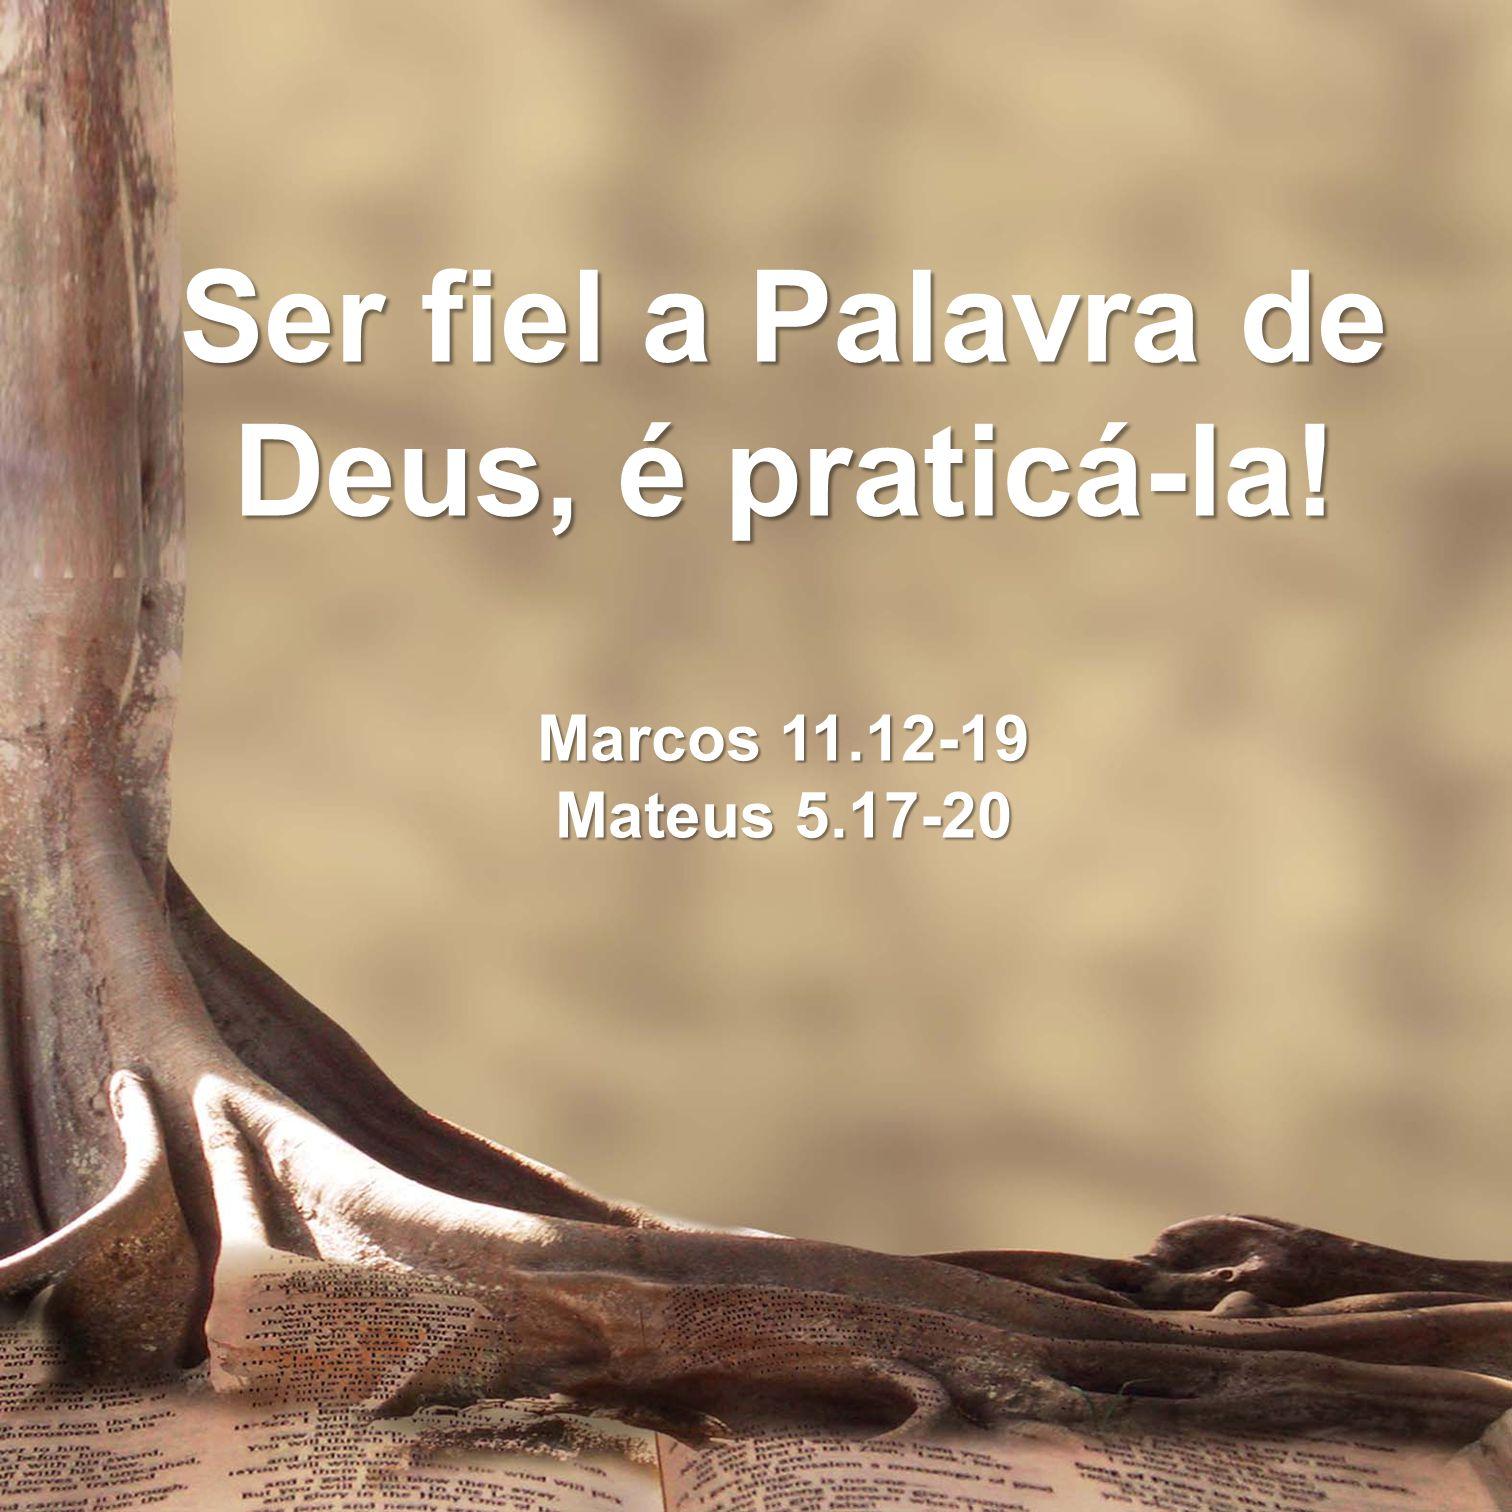 Ser fiel a Palavra de Deus, é praticá-la! Marcos 11.12-19 Mateus 5.17-20